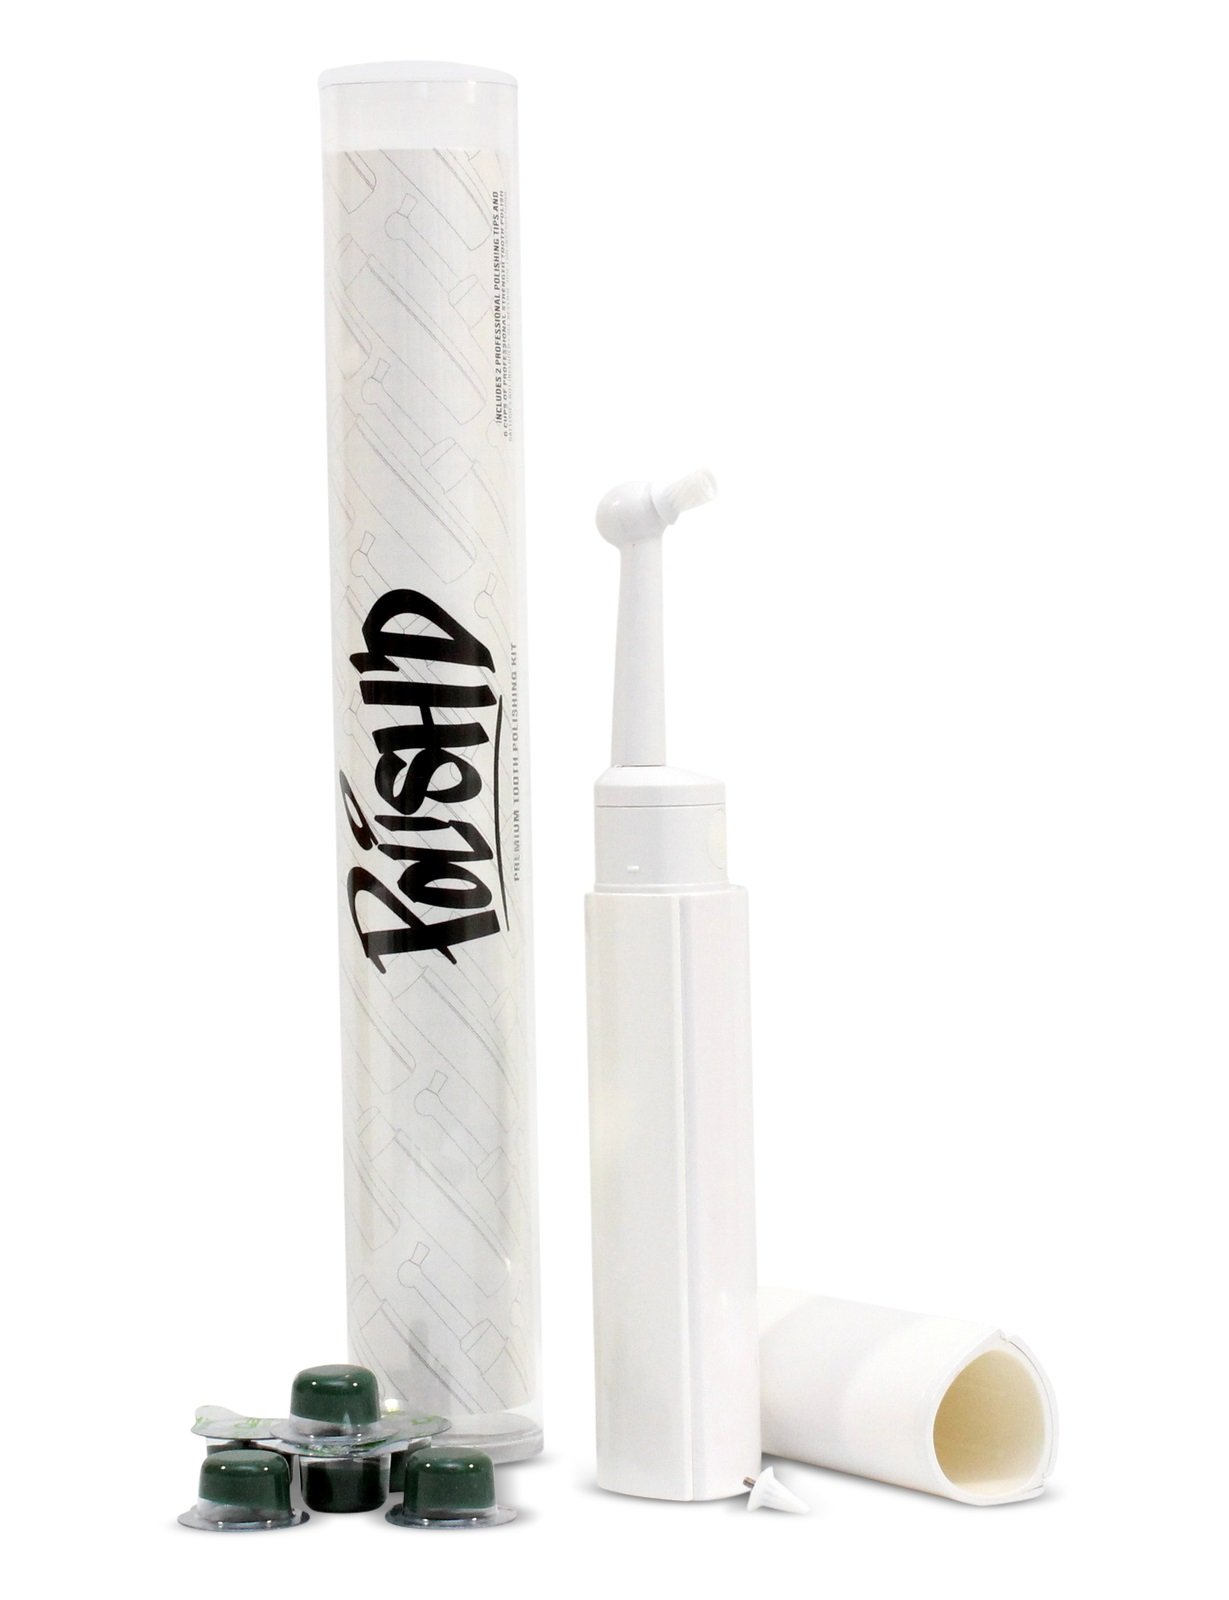 POLISH'D Premium Tooth Polishing Kit w/Professional Strength Polish - MINT (Coarse Grit)